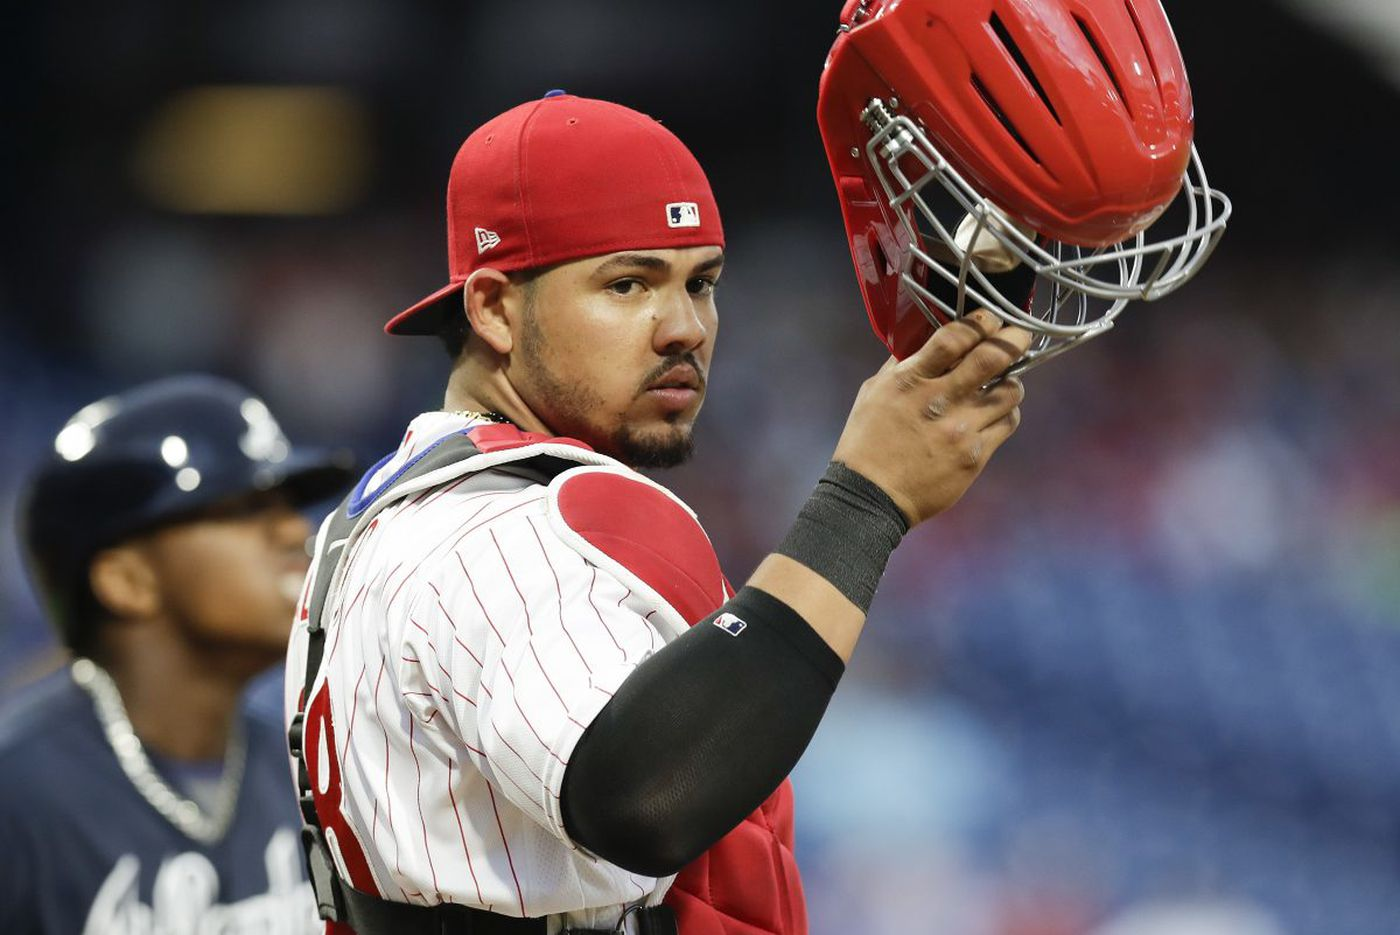 Jorge Alfaro's presence behind the plate boosting Phillies | Scott Lauber